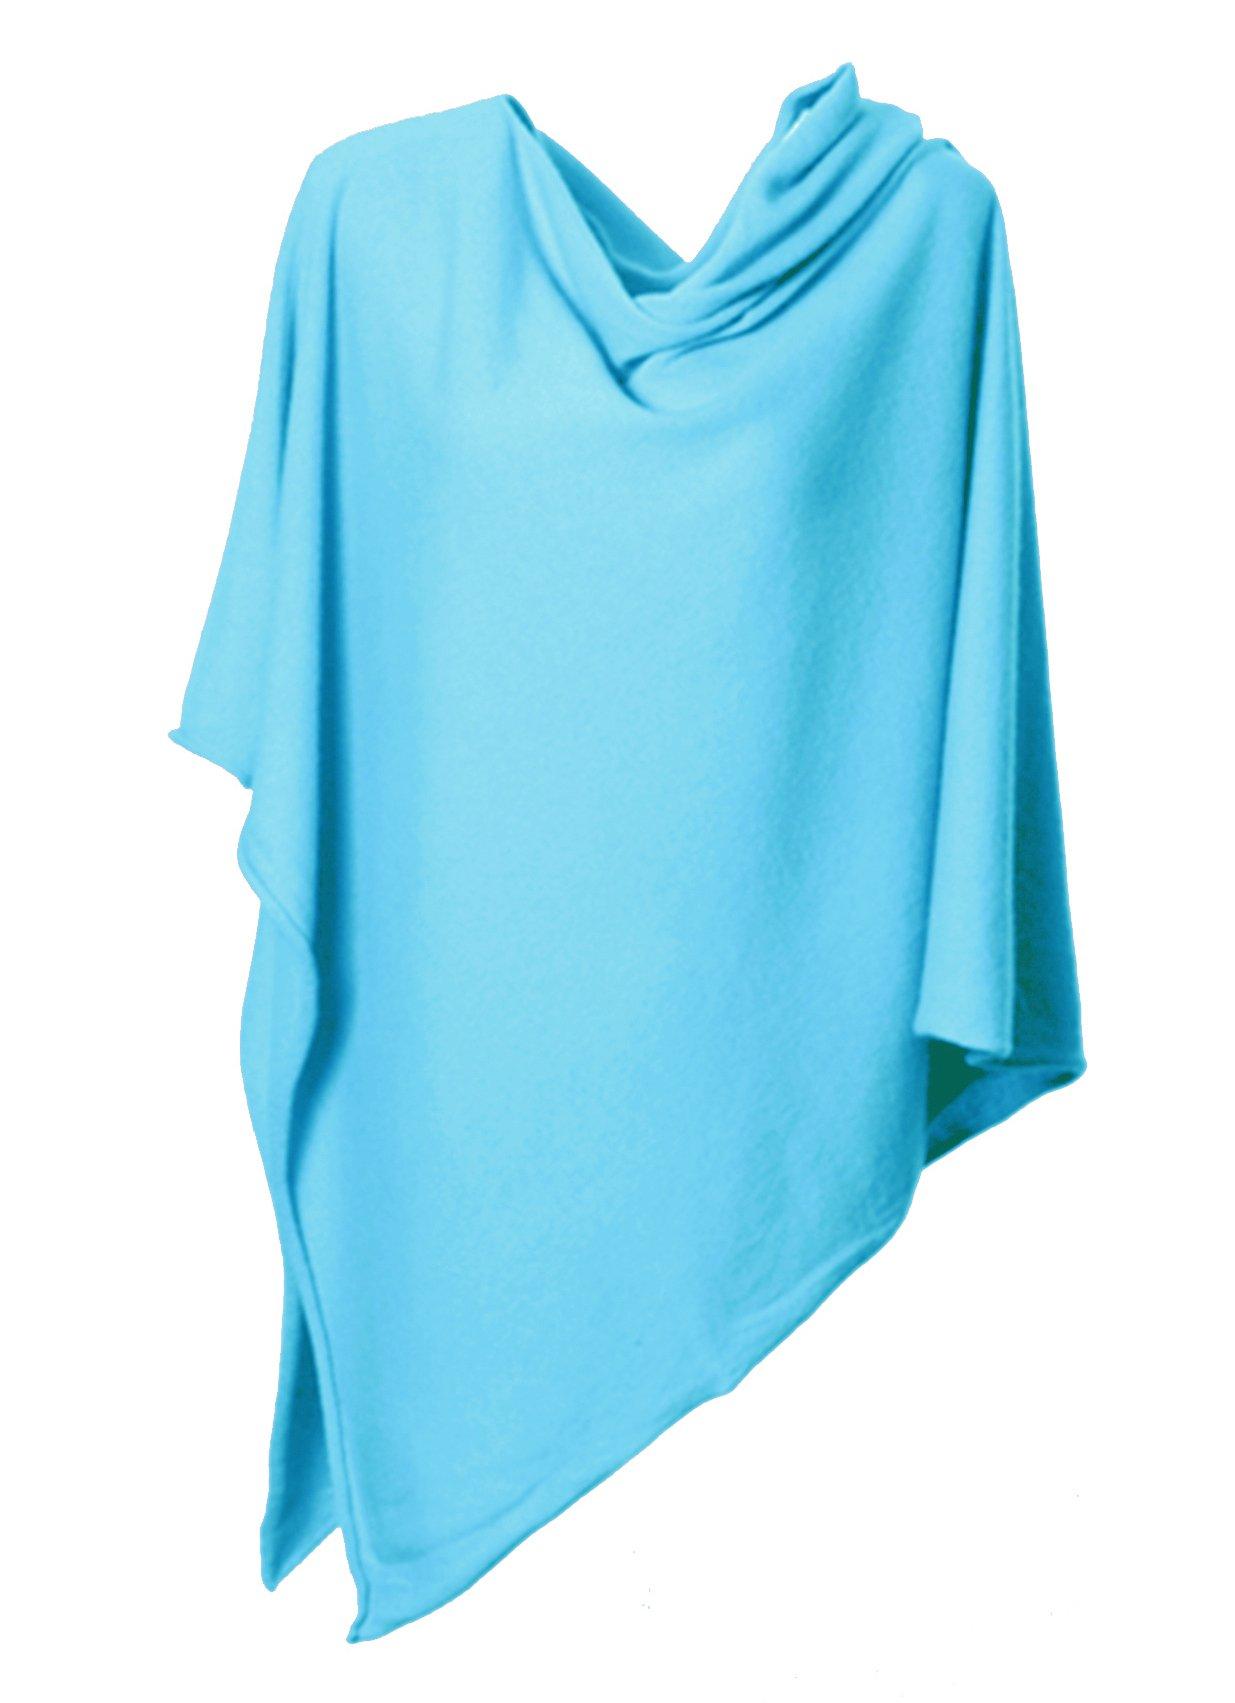 Anna Kristine Pure Cashmere Asymmetrical Draped Poncho - Caribbean Turquoise Blue